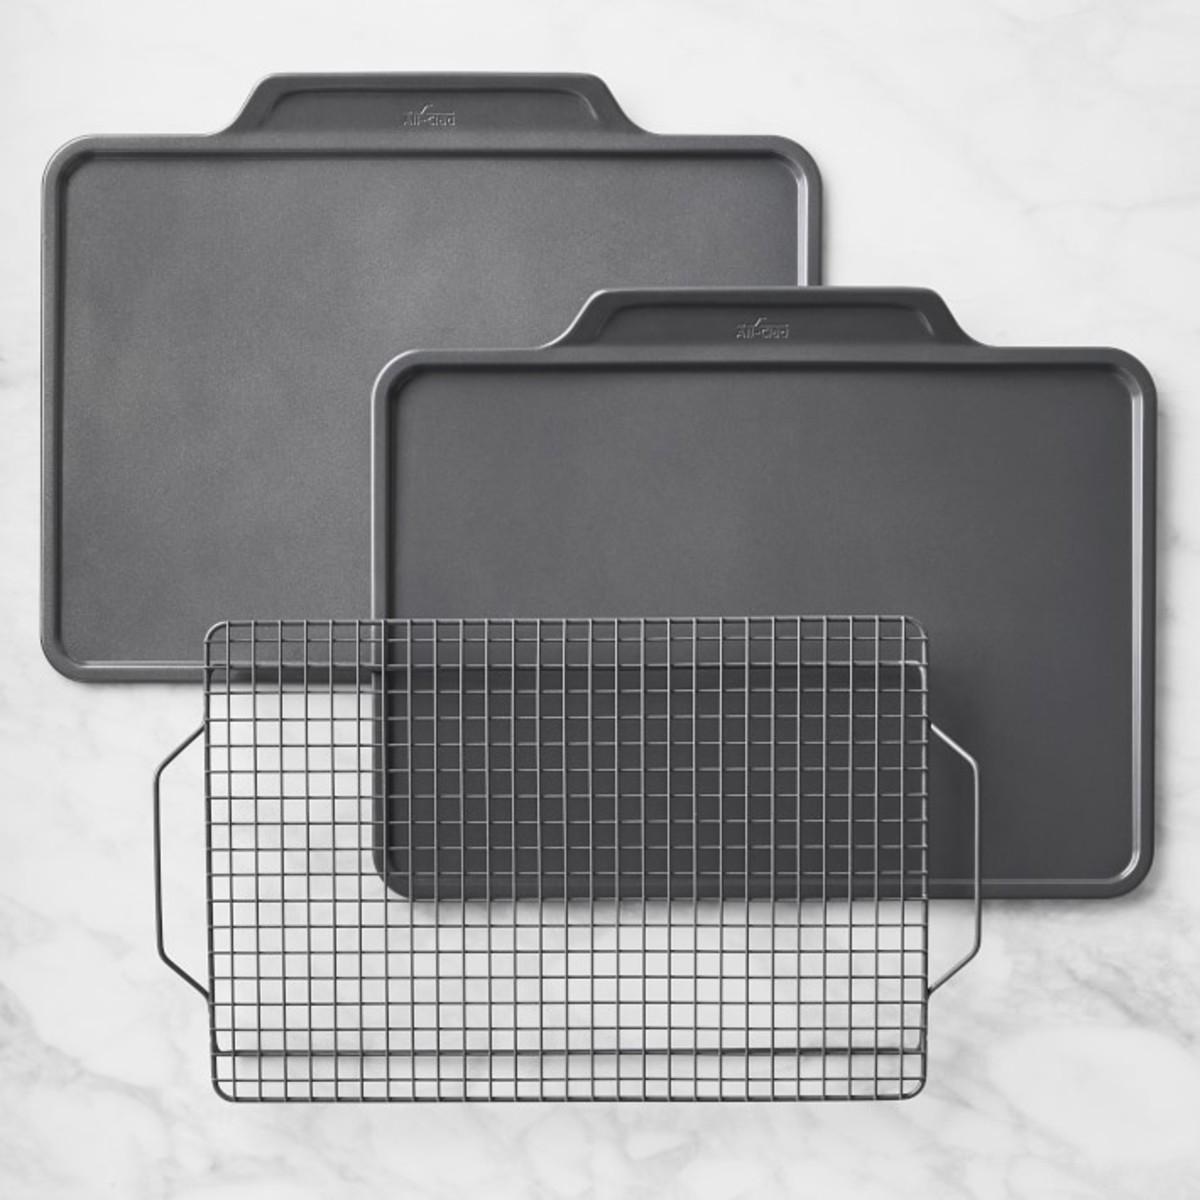 All-Clad Ceramic Nonstick Pro Release Bakeware 3-Piece Set